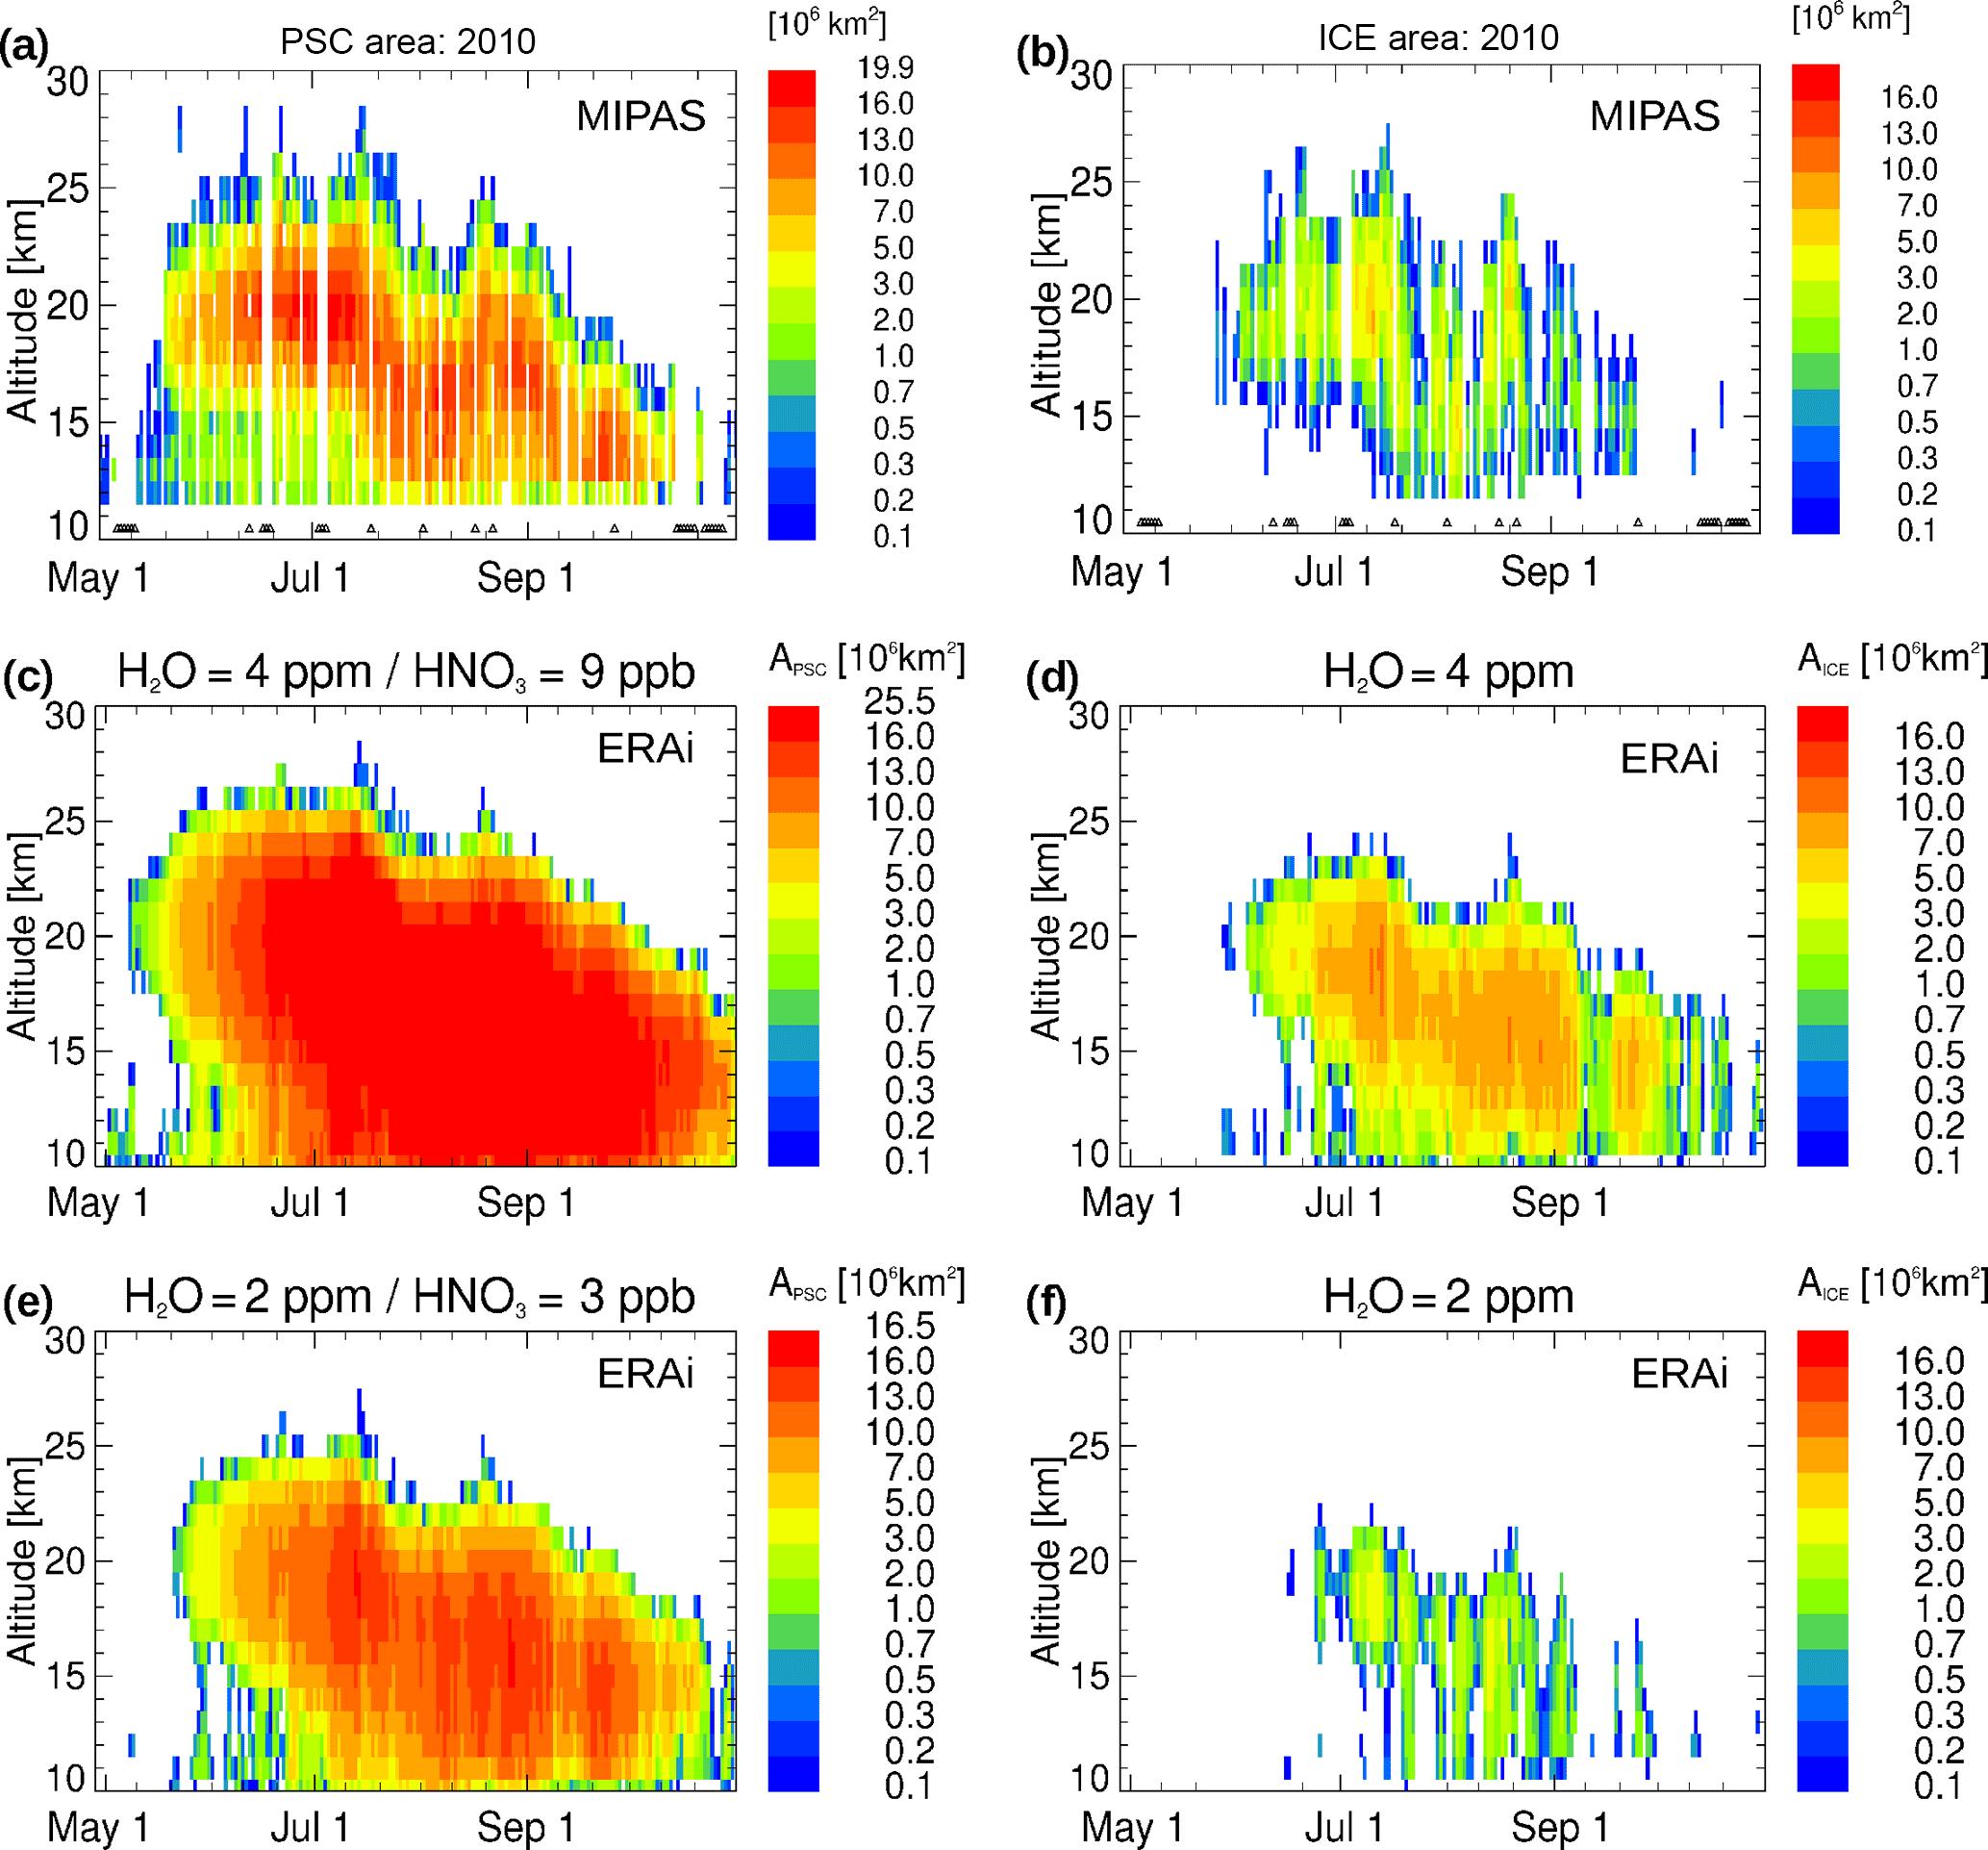 ACP - A climatology of polar stratospheric cloud composition